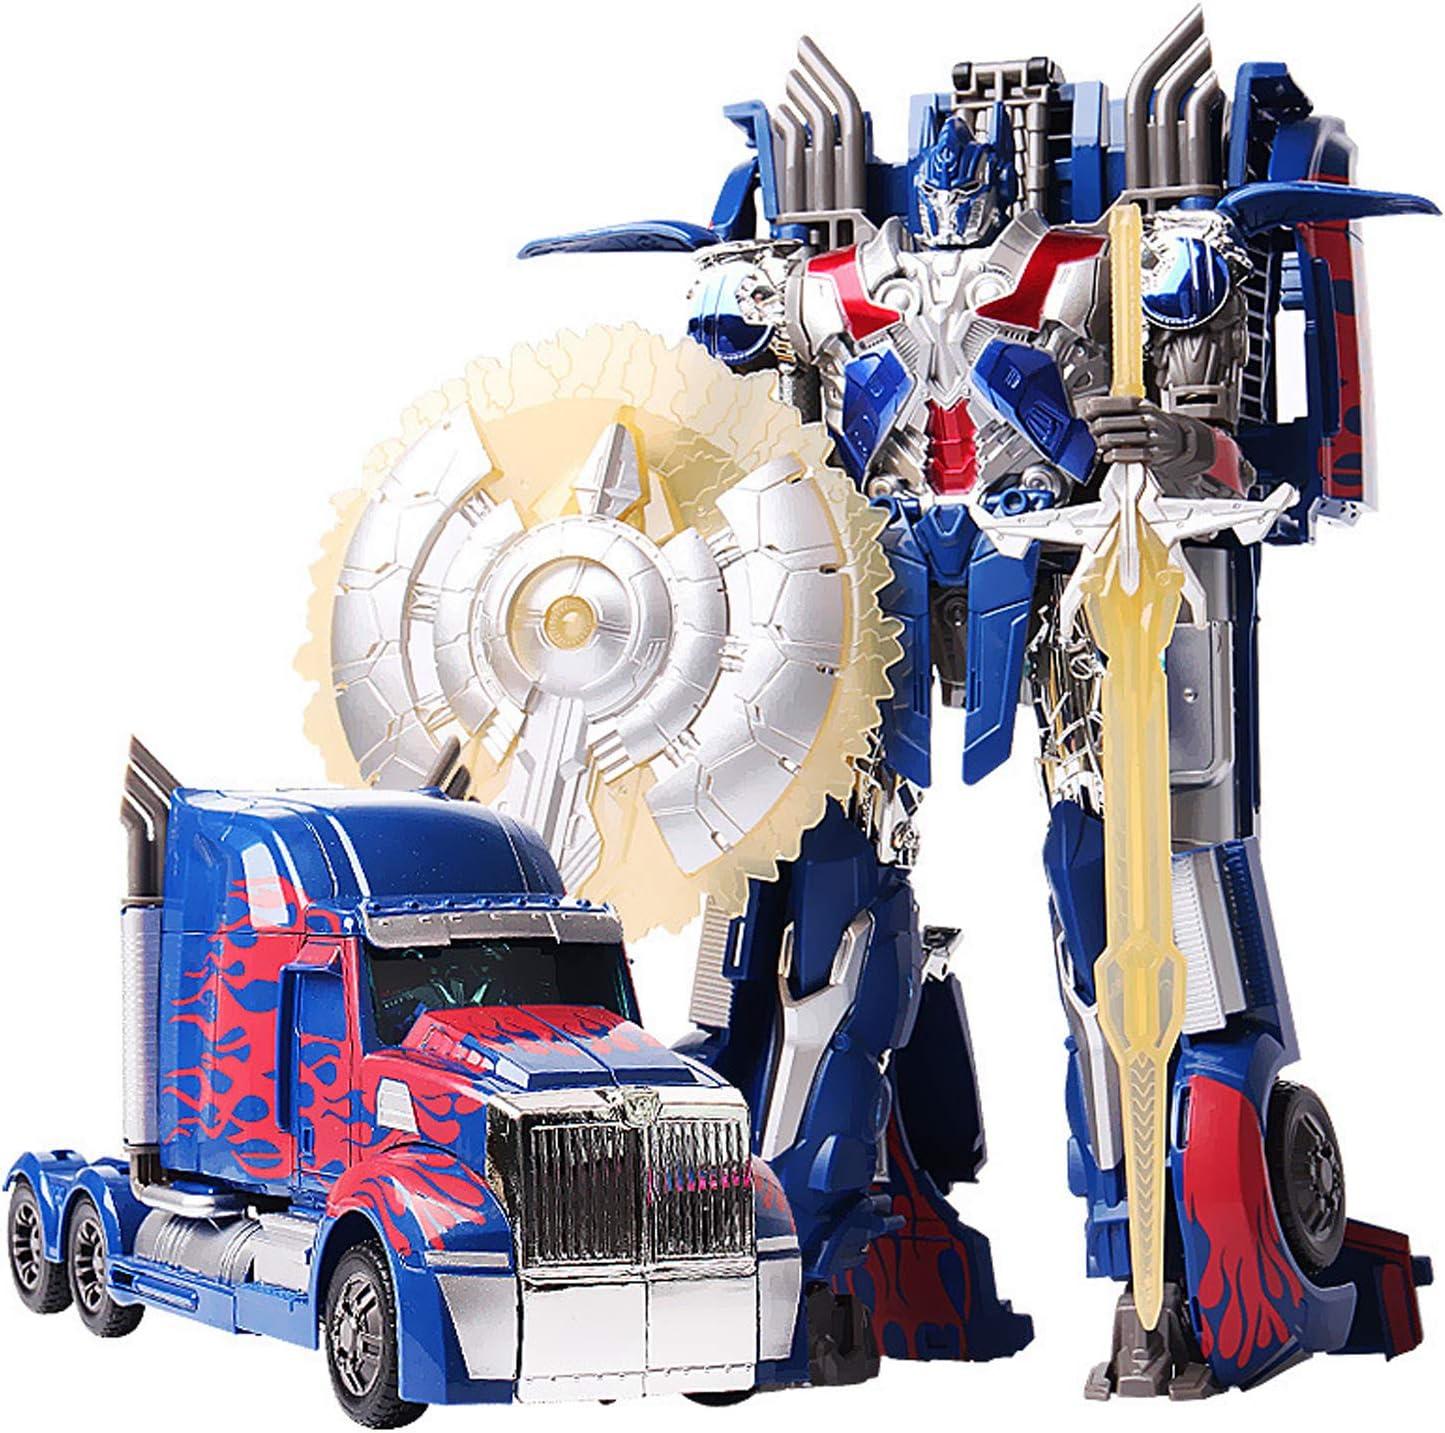 Deformed Car Robot Toys Manual Product Optimus Deformation Mo El Paso Mall Prime